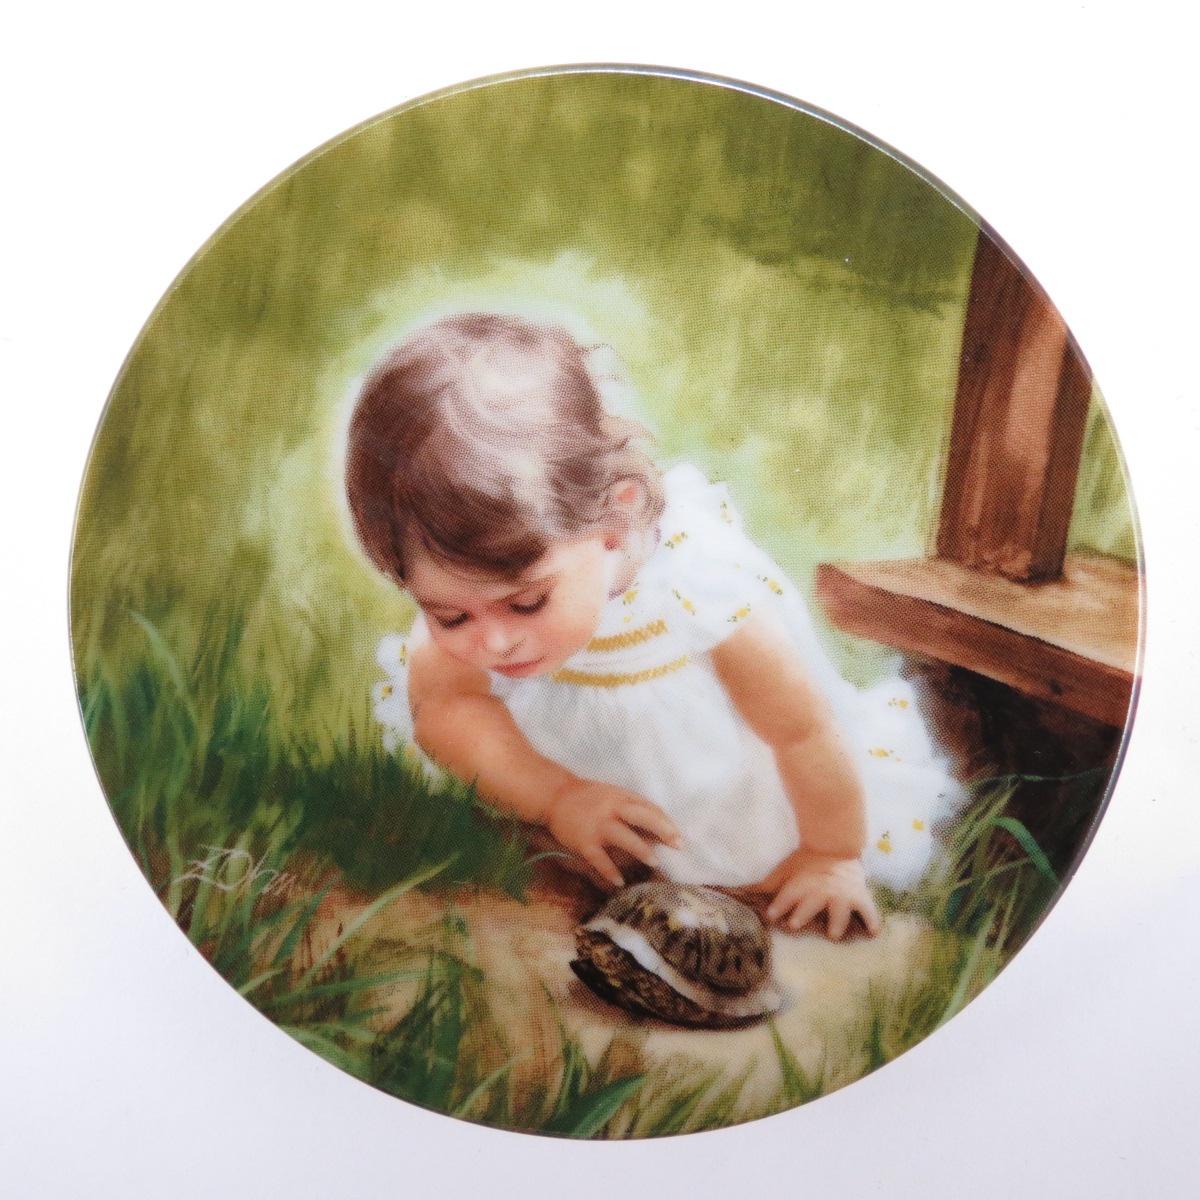 Декоративная тарелка Pemberton & Oakes Любимый детский художник Америки, 91466783